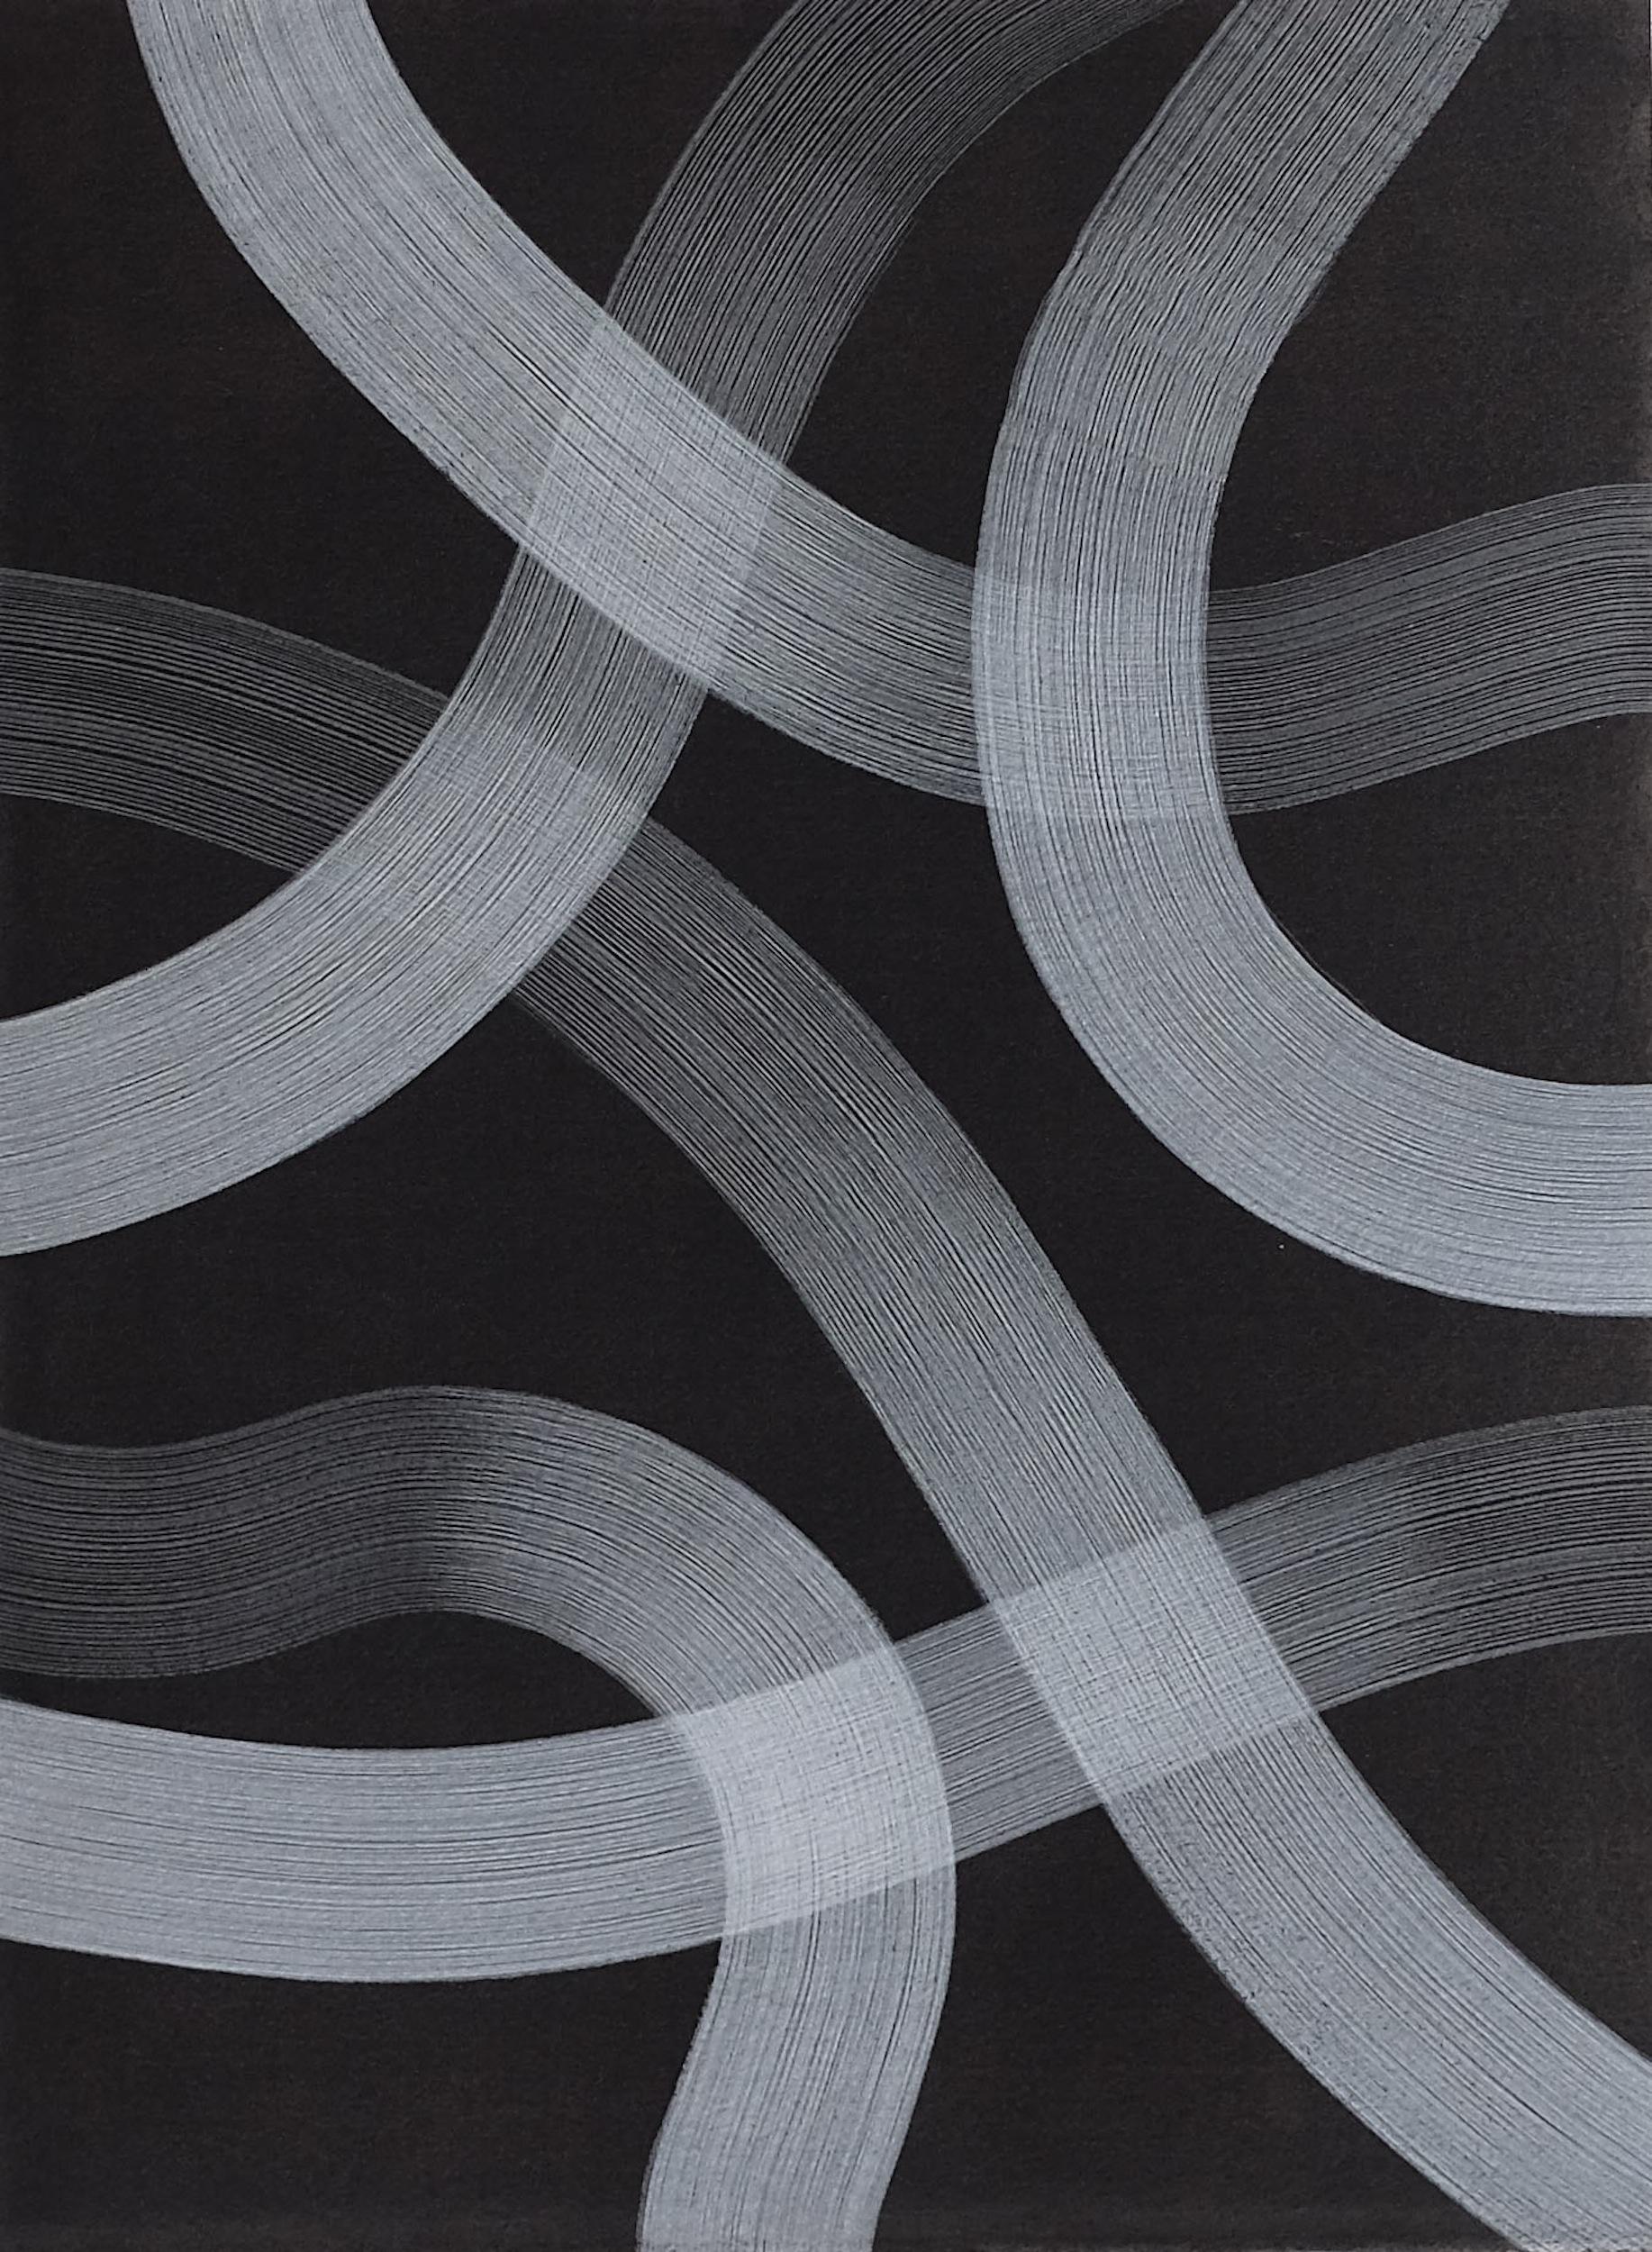 Untitled (2016)  Casein Paint on Paper  38 x 28 cm